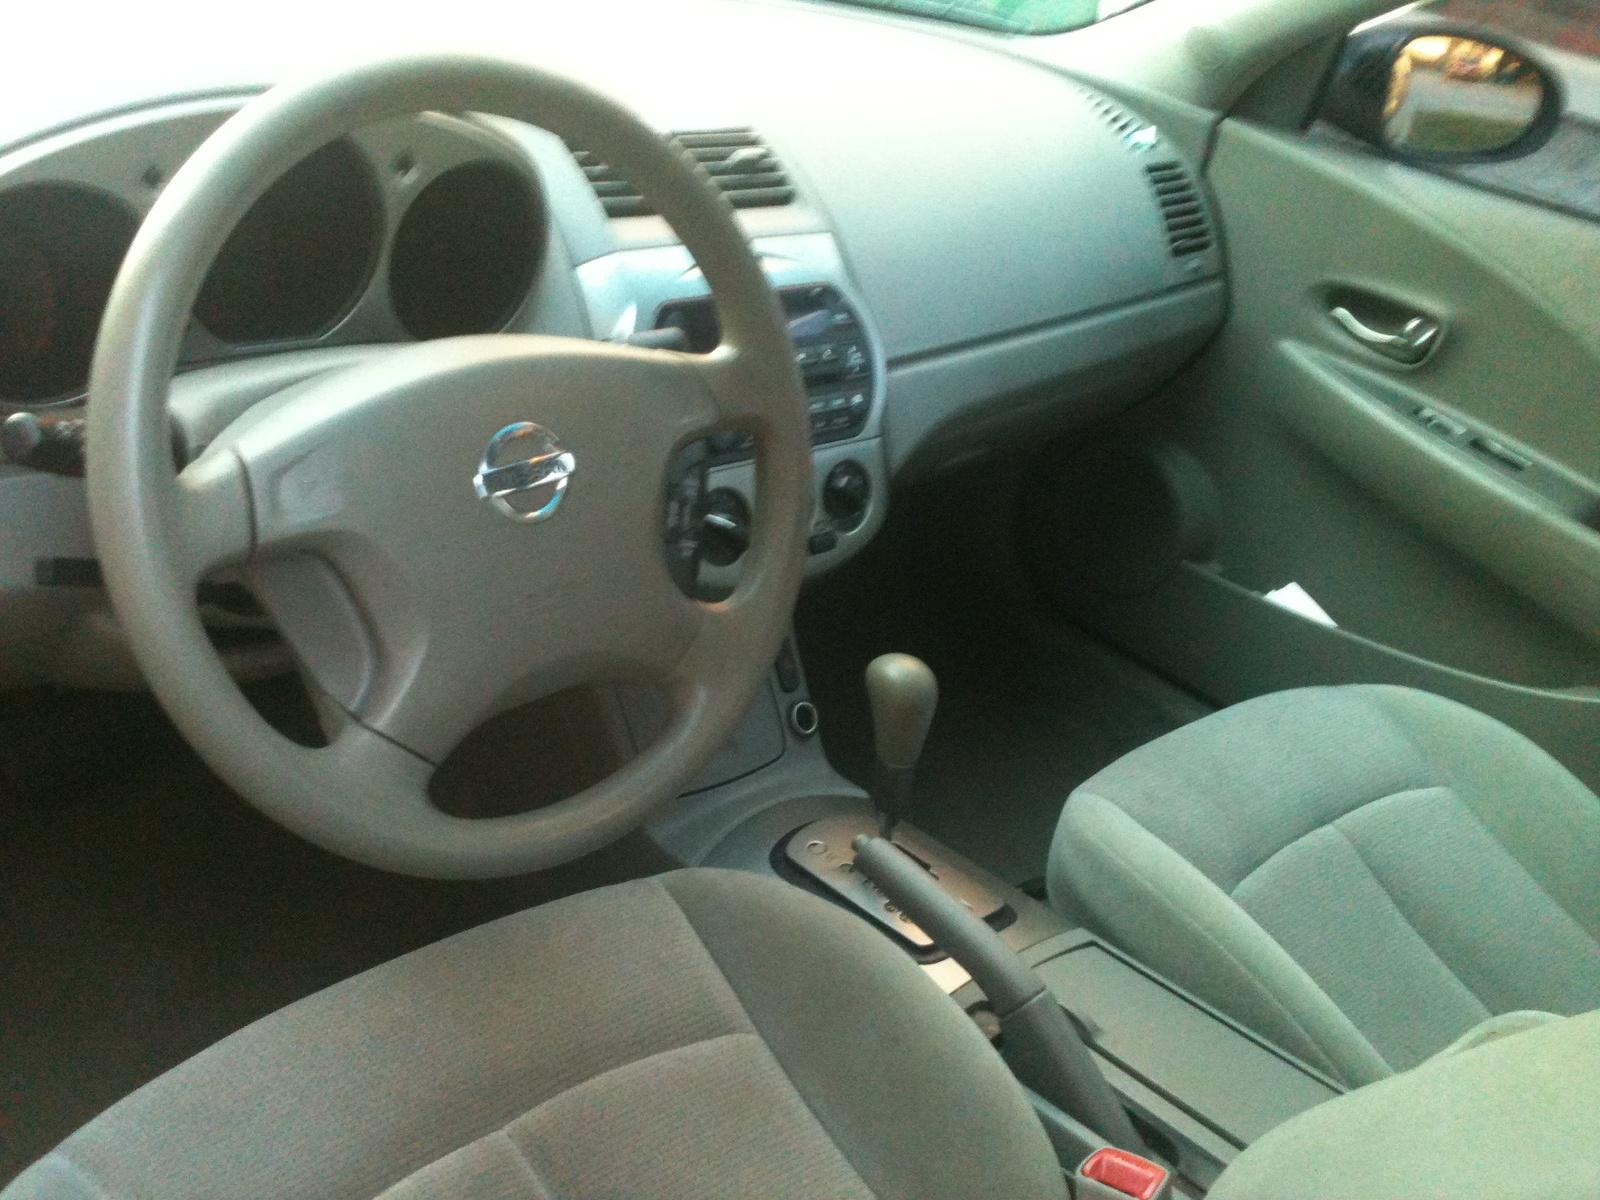 2005 Nissan altima p0725